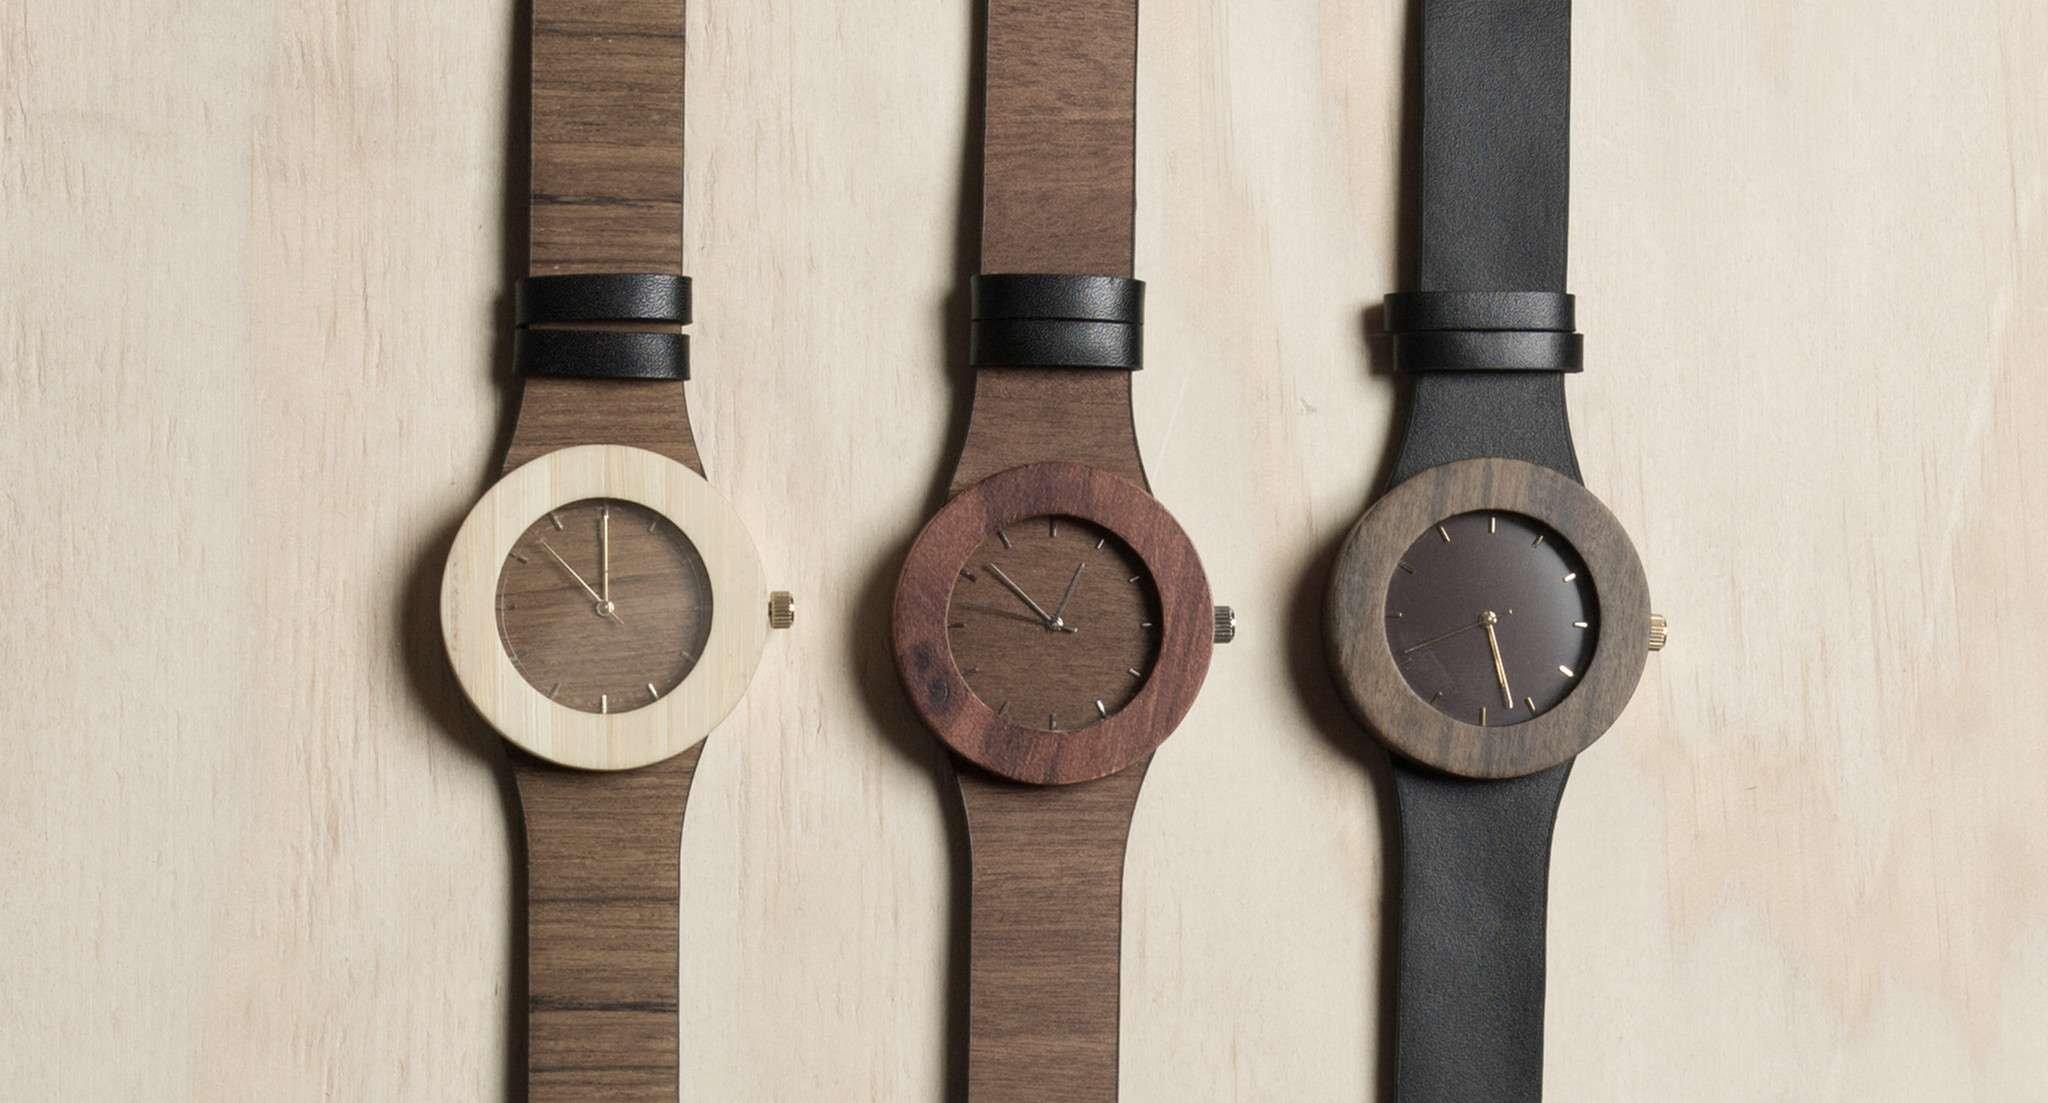 Analog watch & co